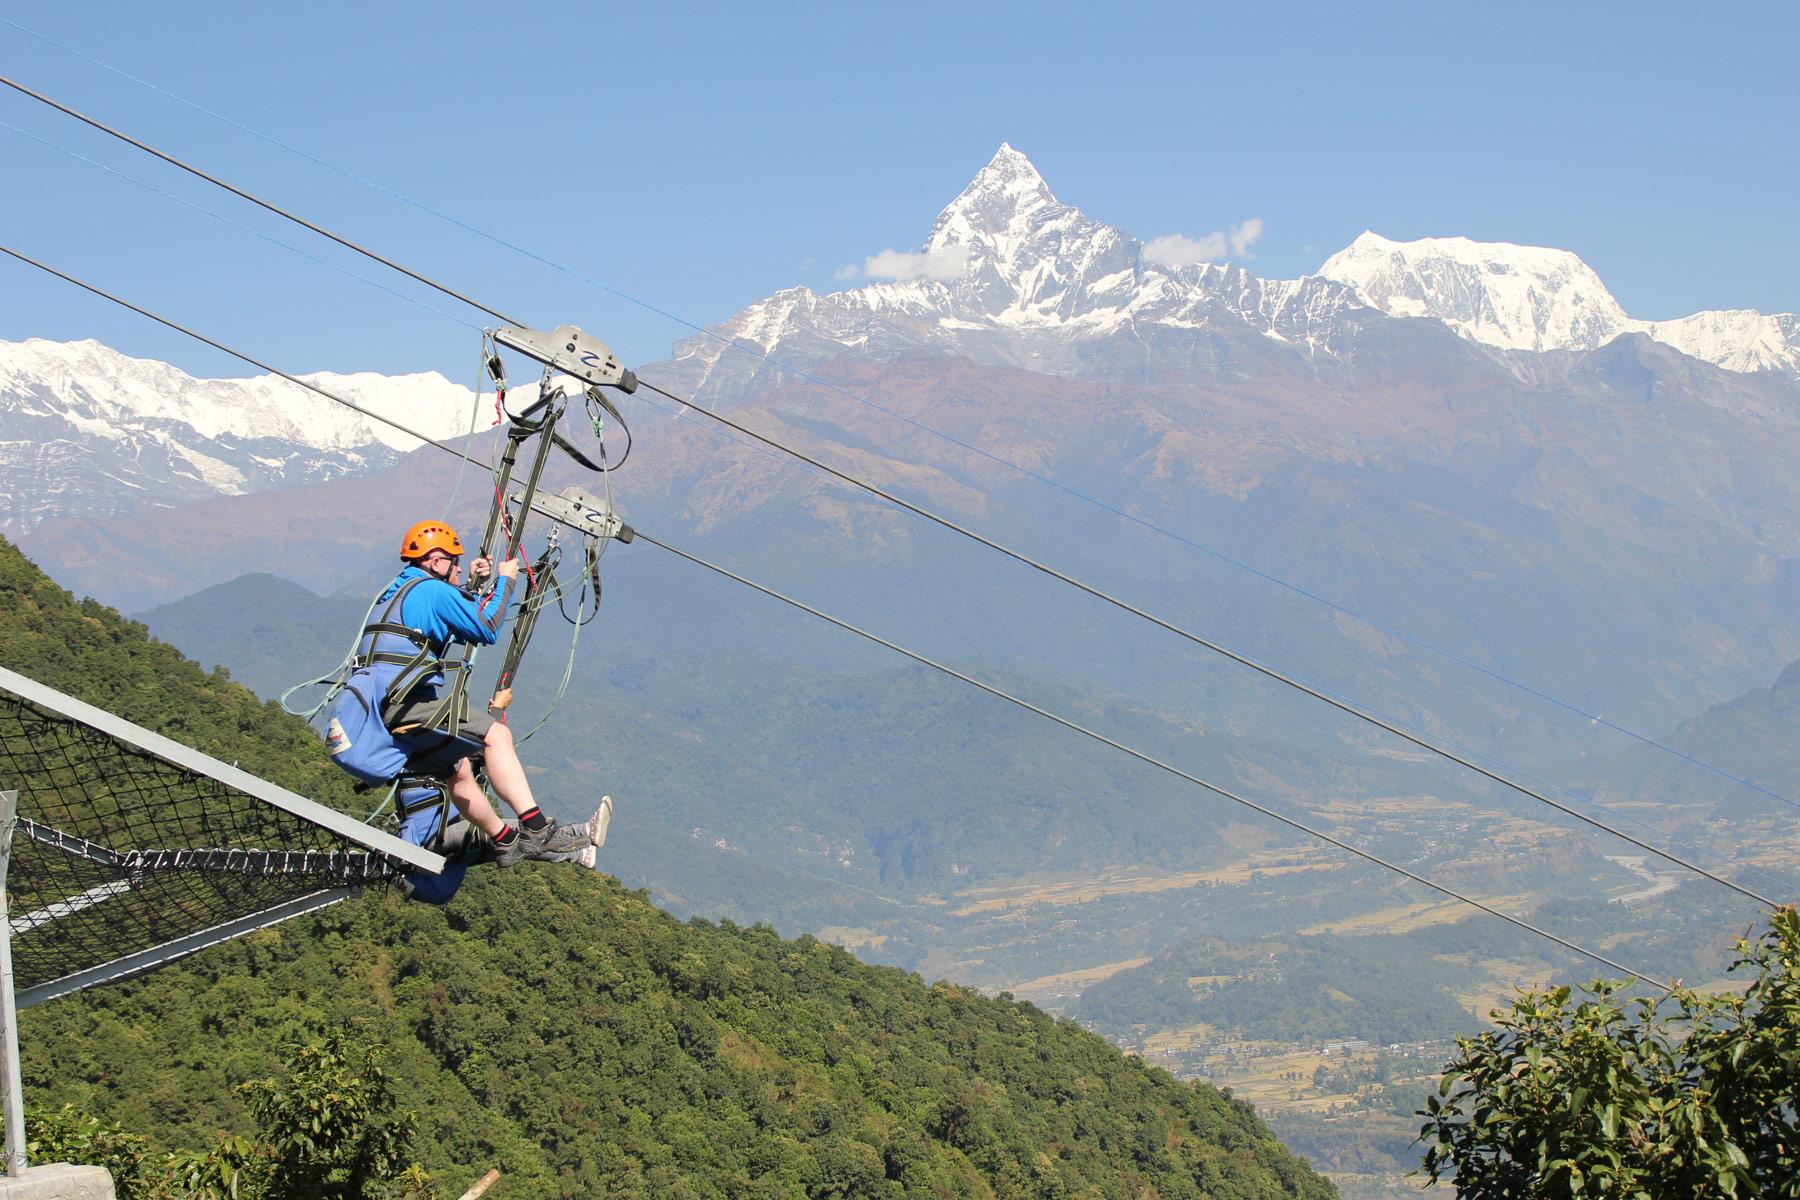 Experience 2000 feet of vertical drop on a zipline